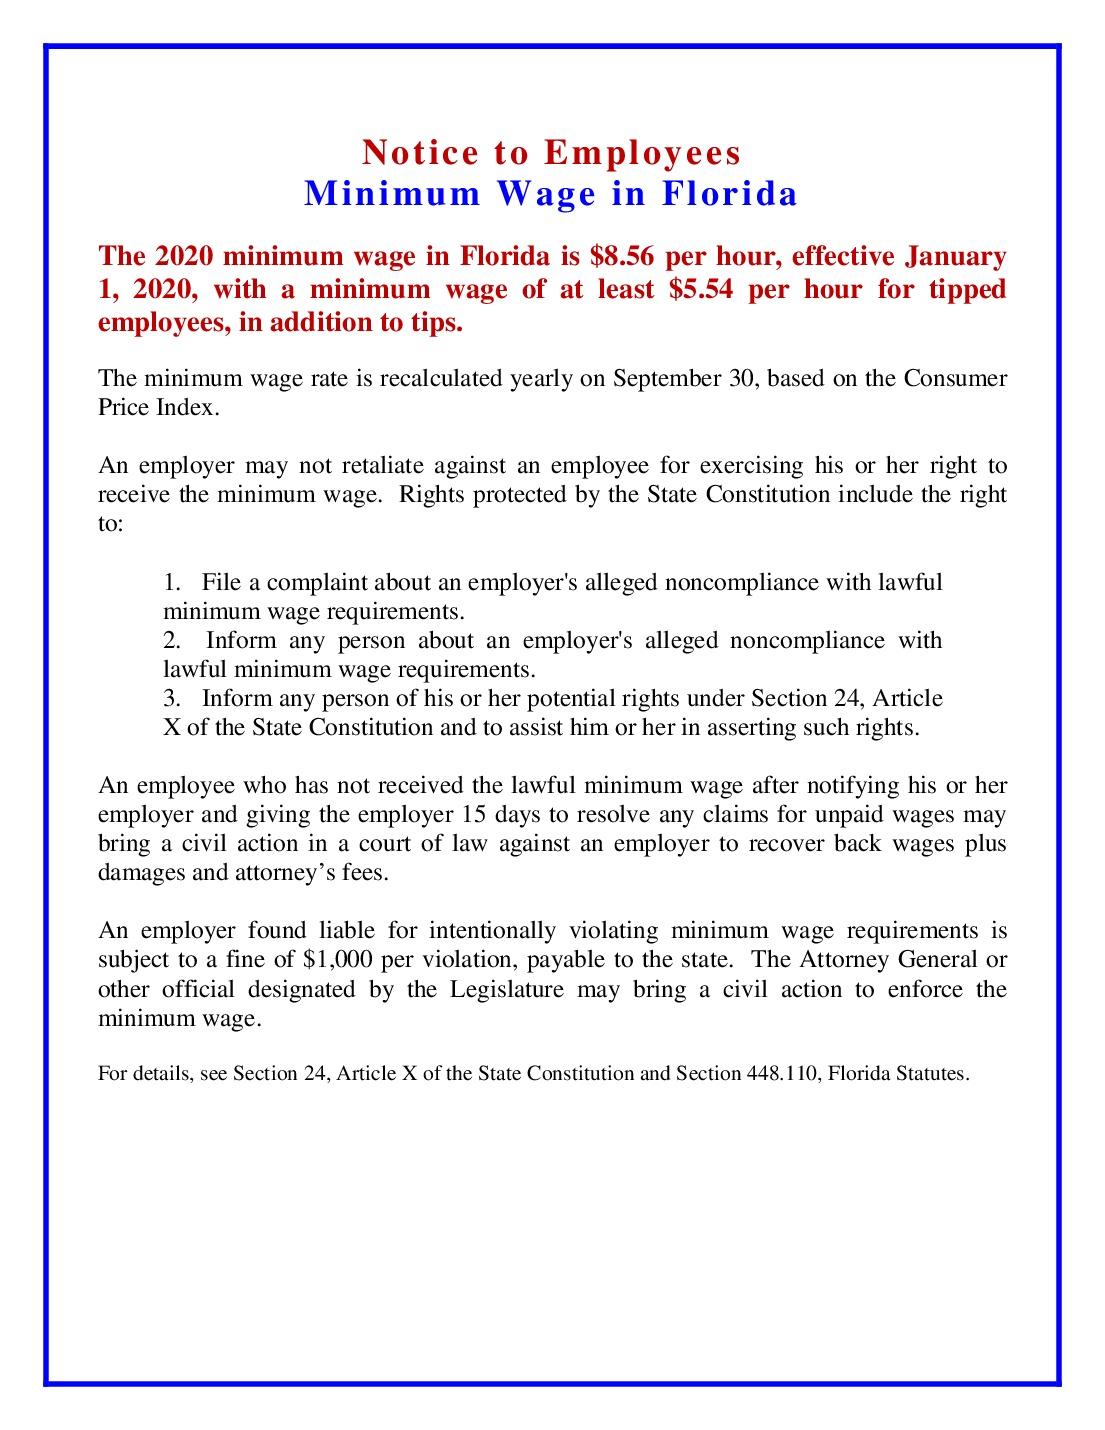 florida minimum wage labor law poster 2021